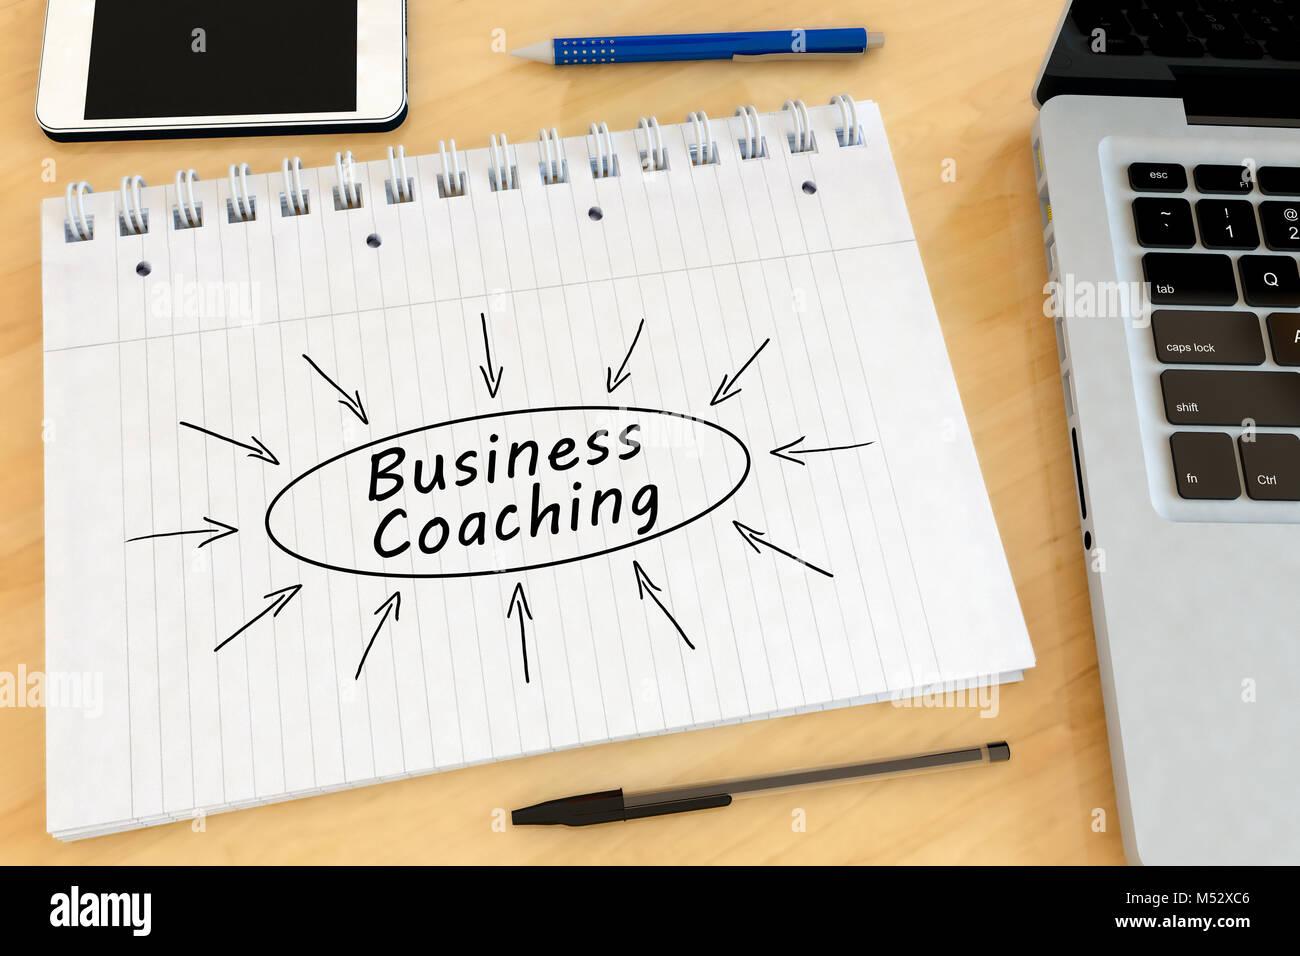 El coaching empresarial concepto de texto Imagen De Stock